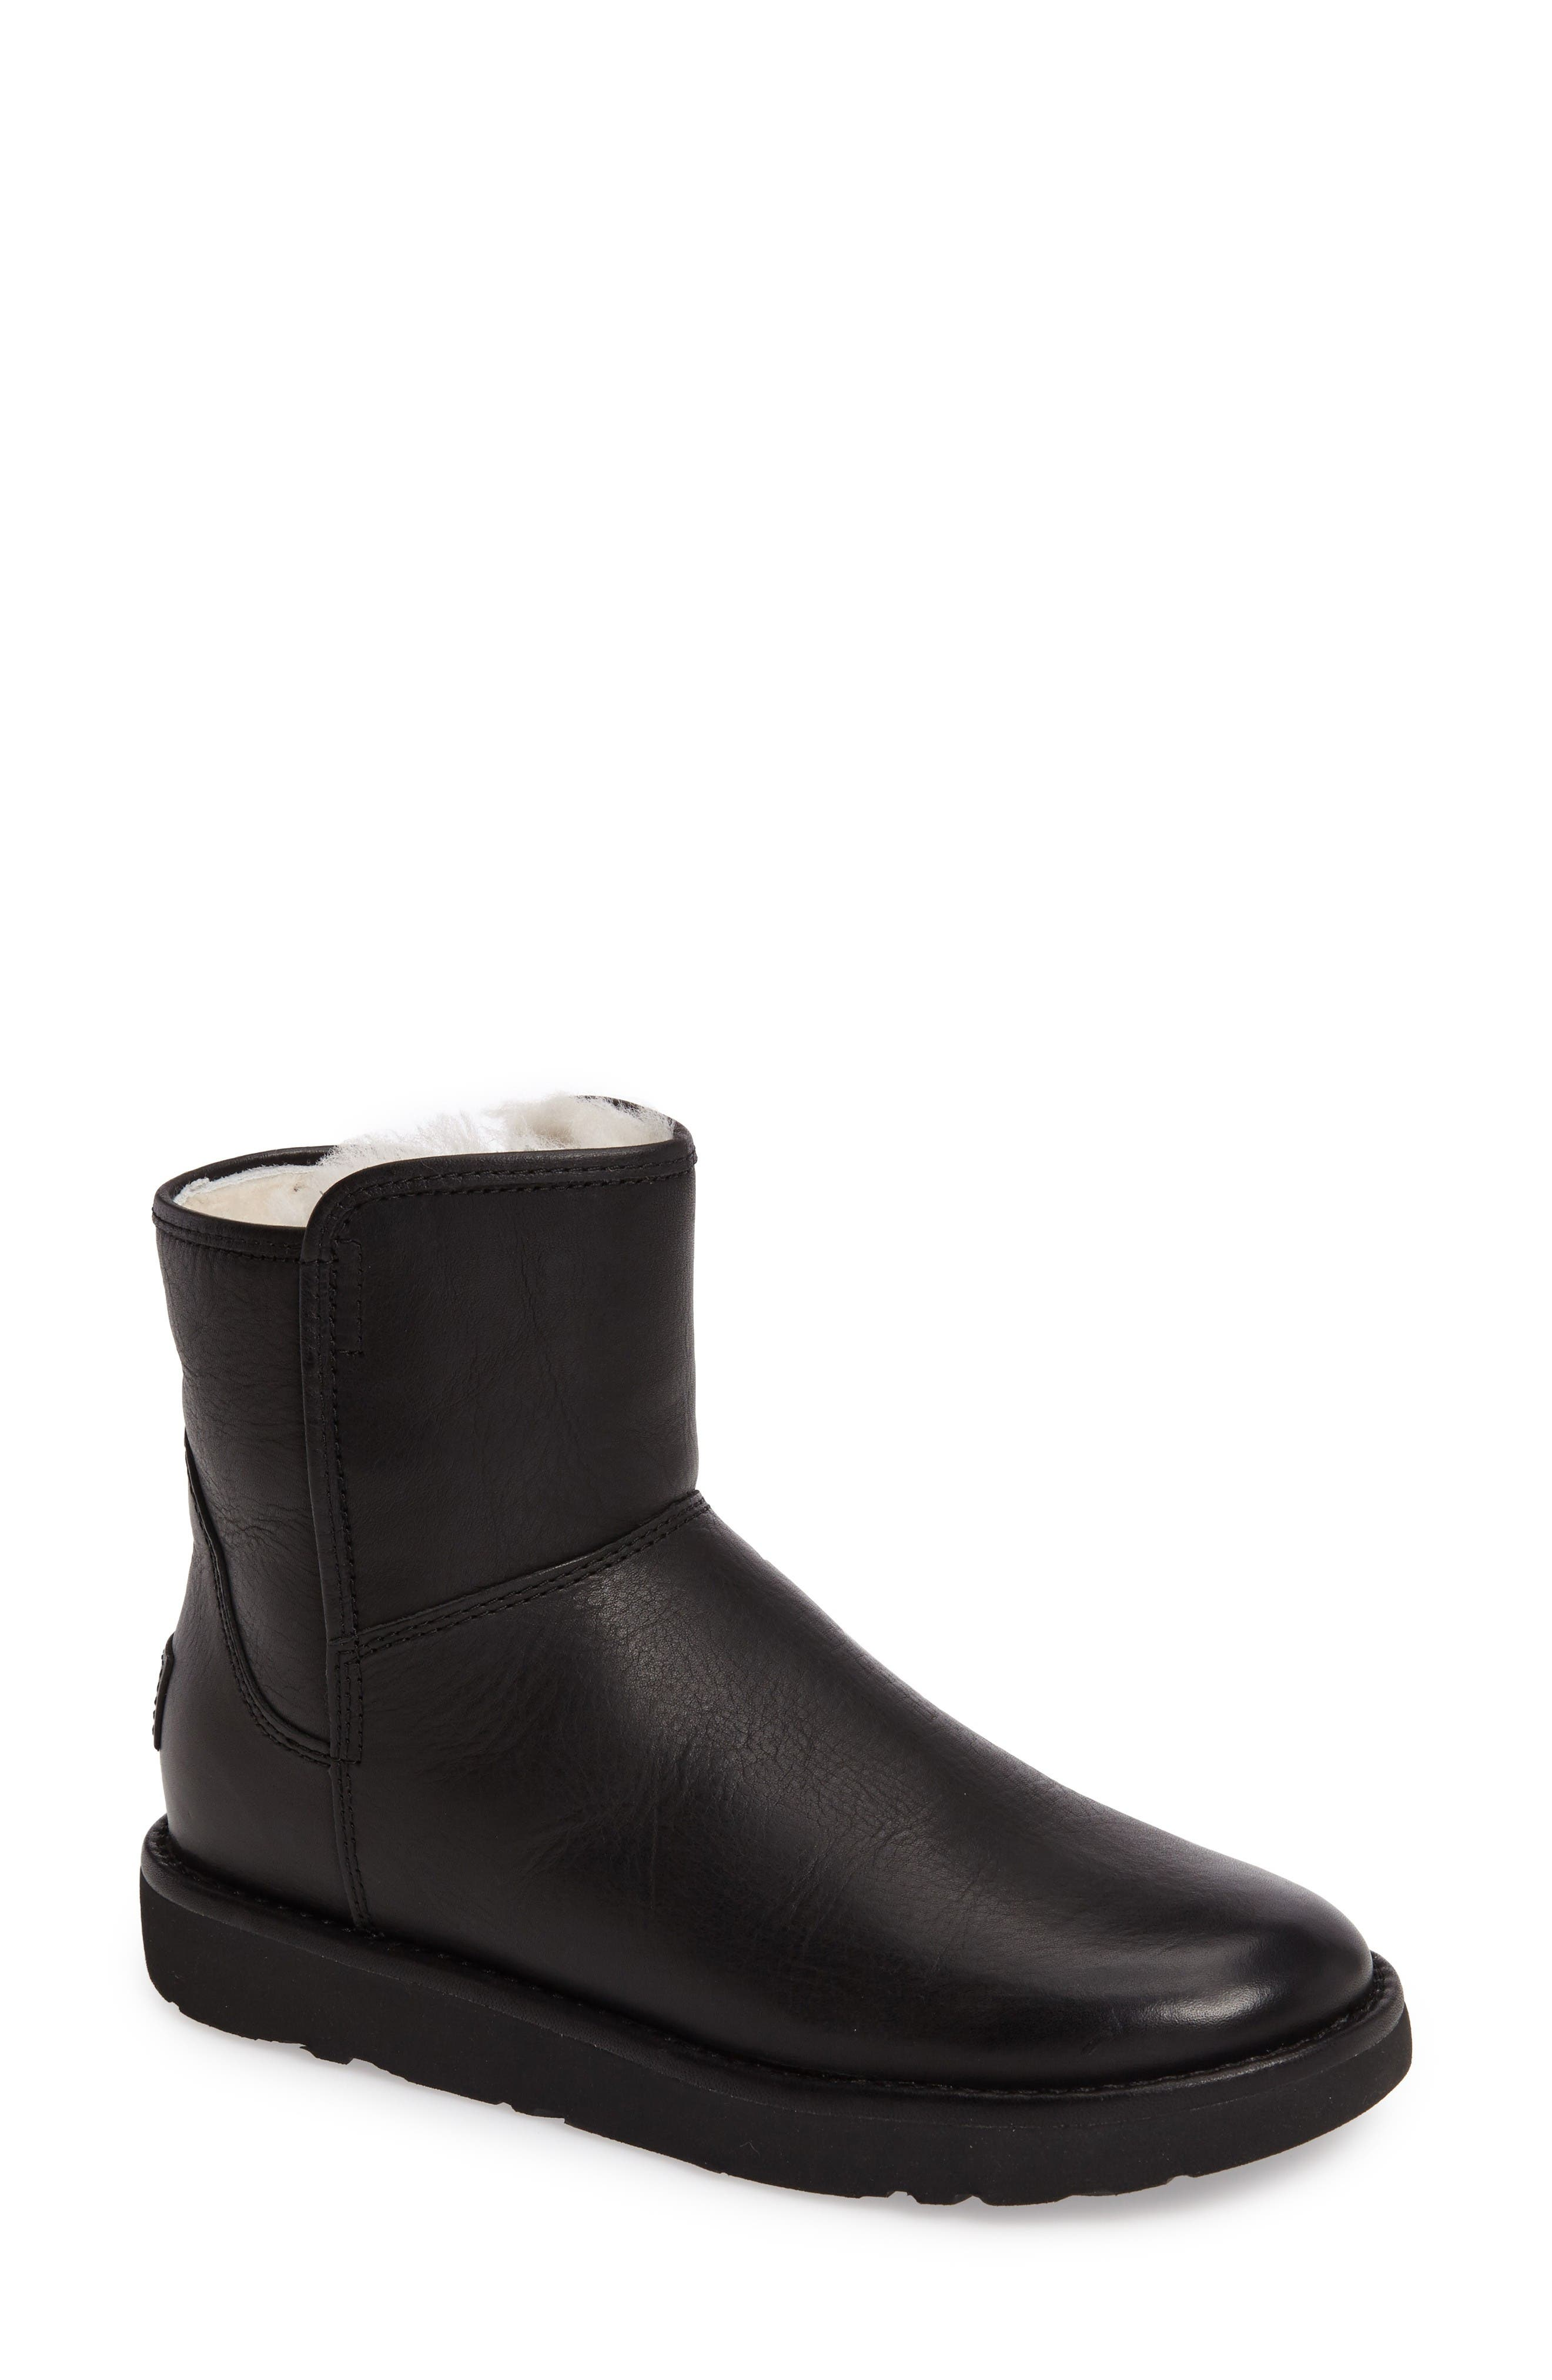 Newest UGG Australia Bonham Black Womens Ankle Boots Outlet UK1592